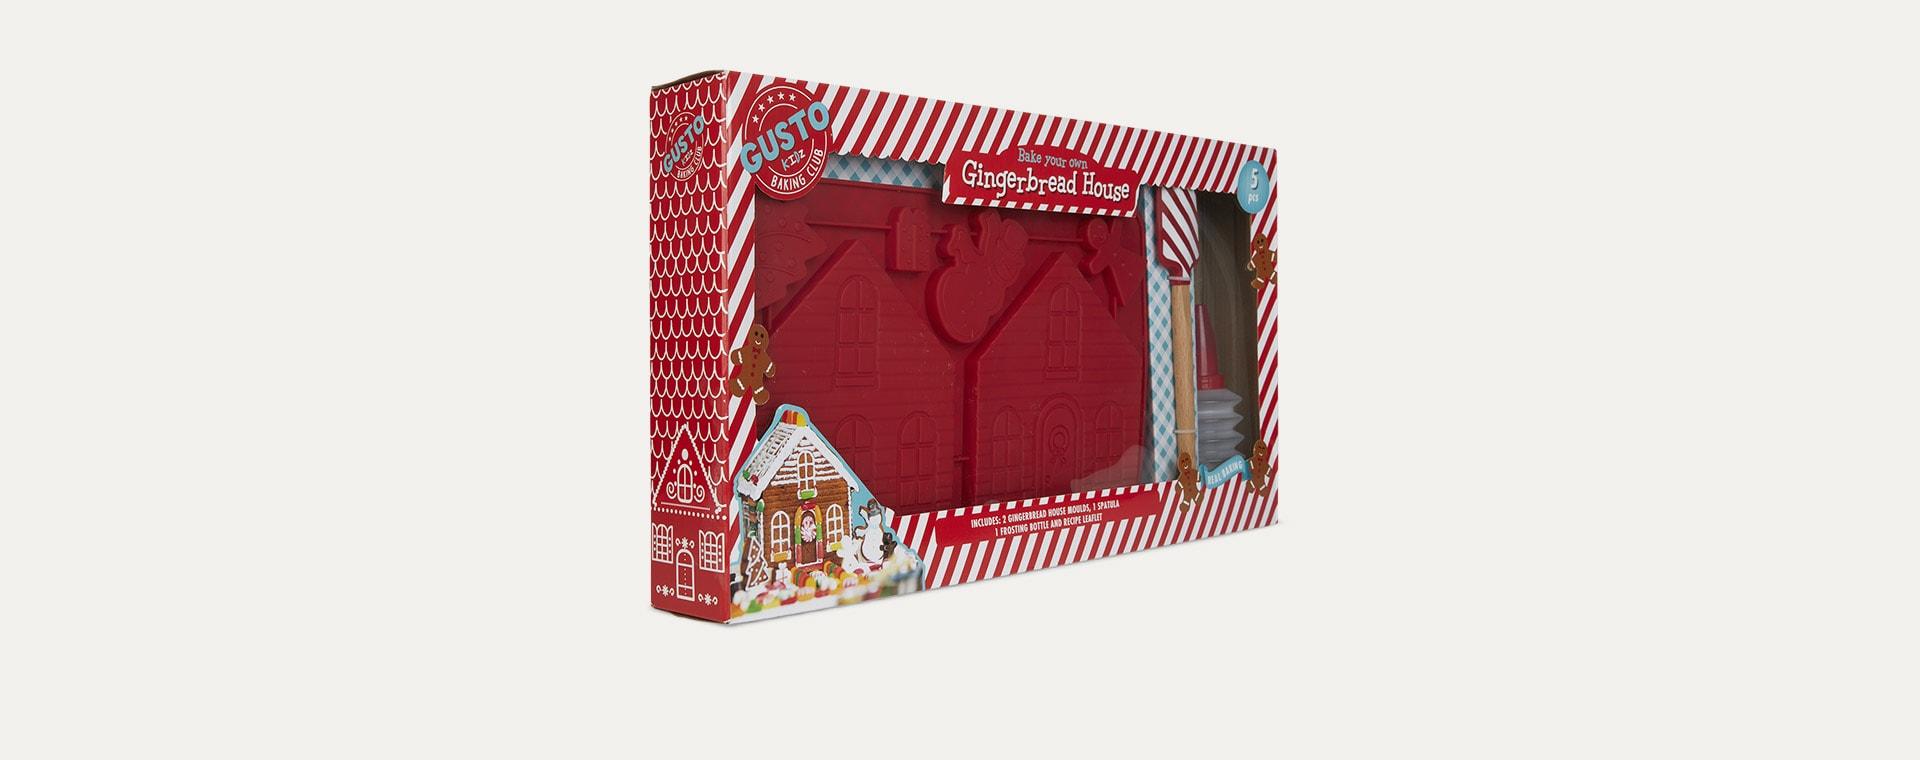 Multi Gusto Gingerbread House Baking Set